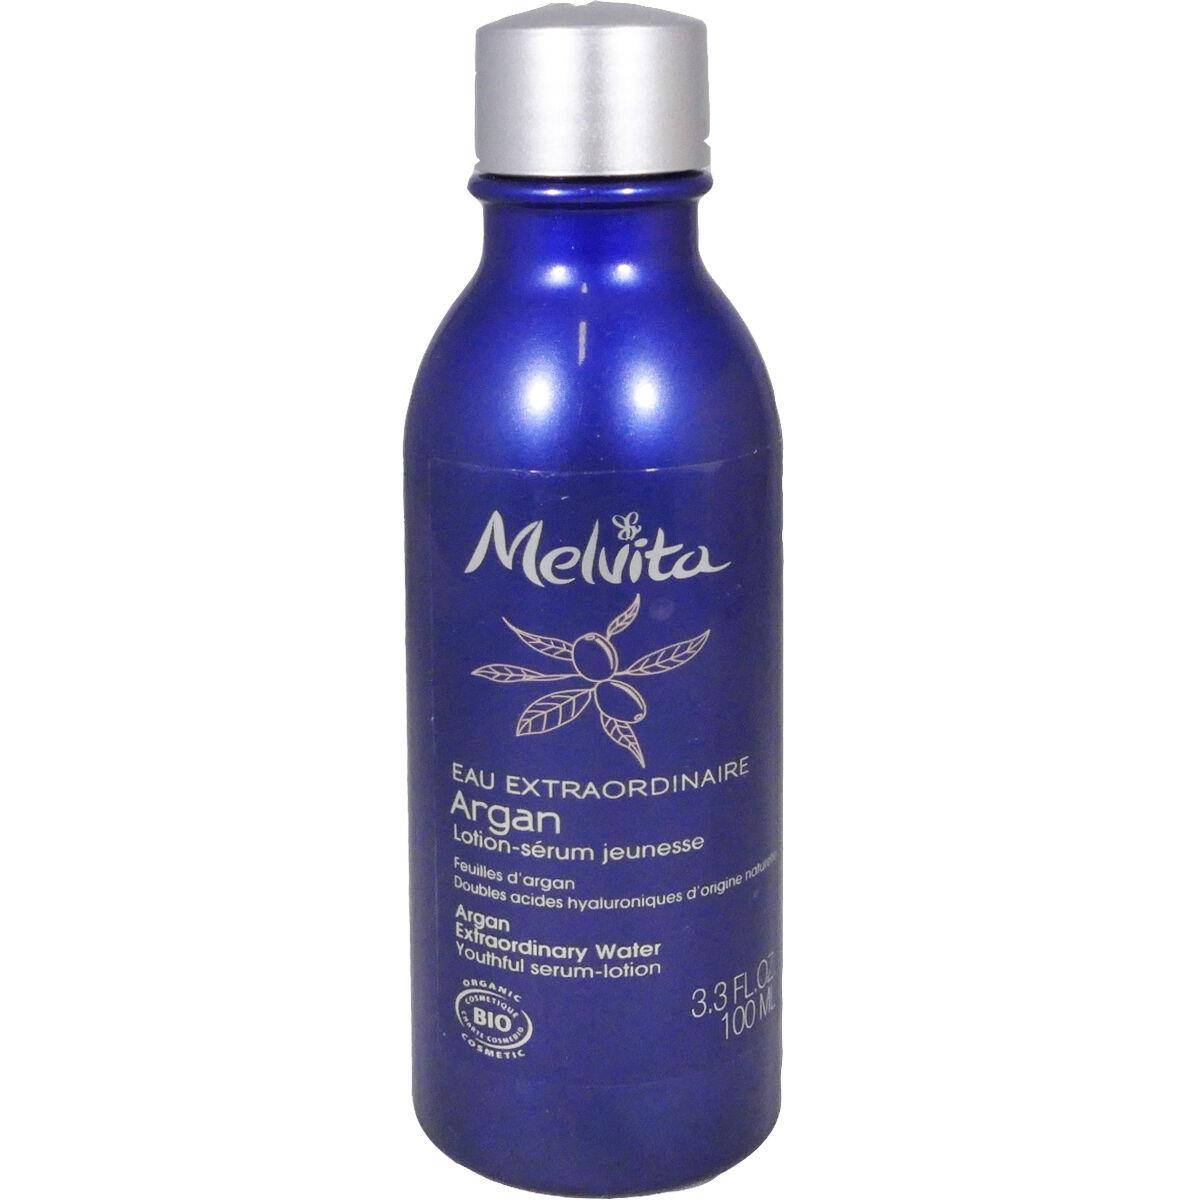 Melvita eau extraordinaire argan lotion-serum 100 ml bio